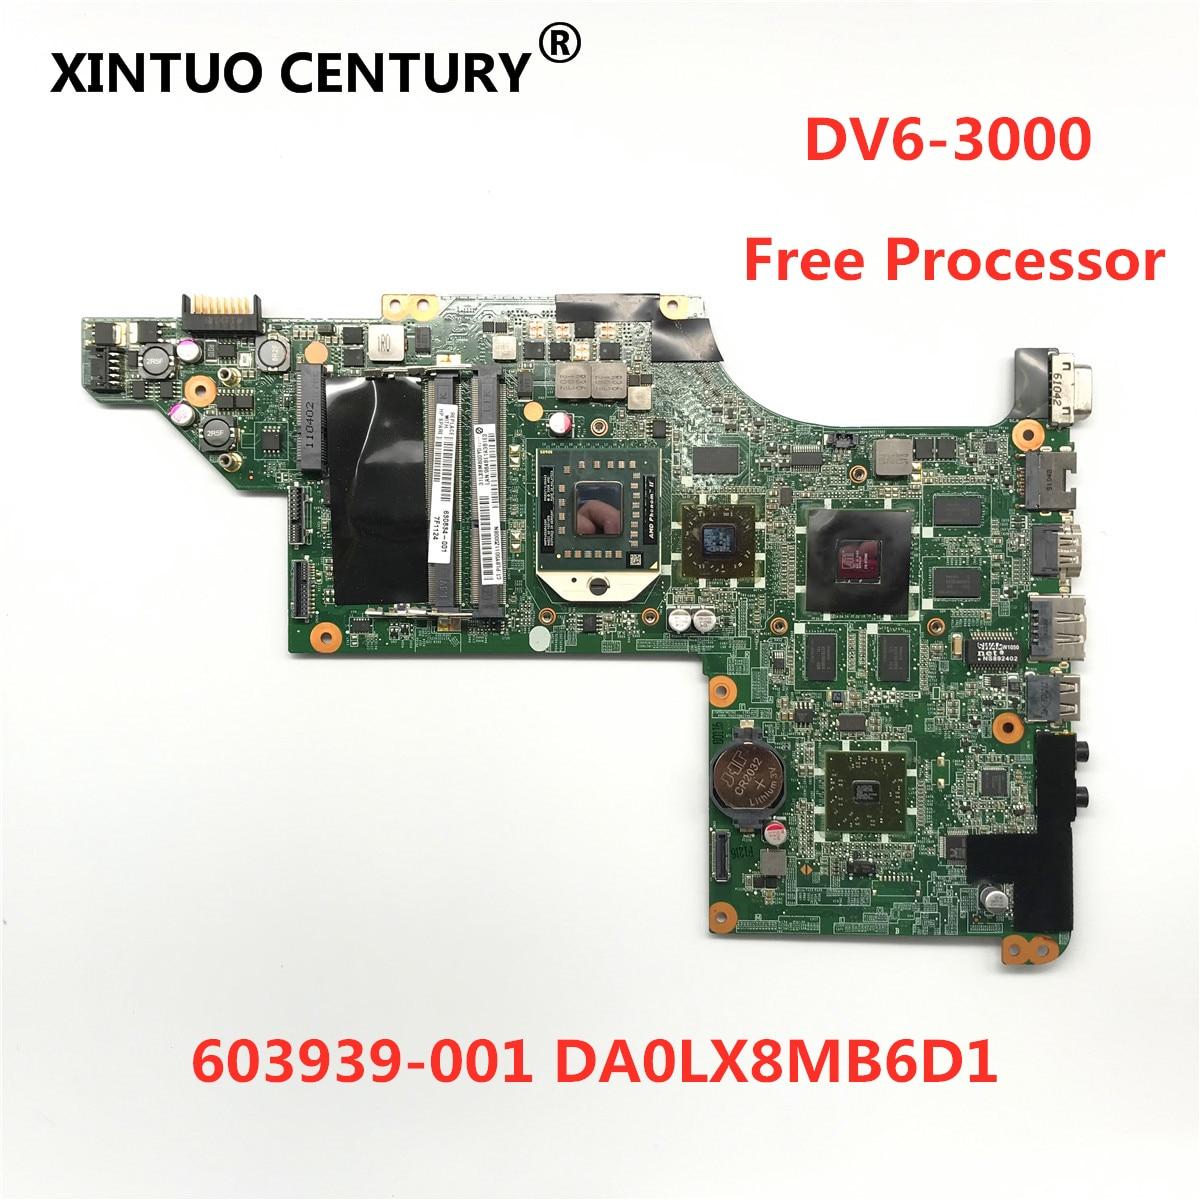 603939-001 DA0LX8MB6D1 اللوحة الرئيسية ل HP بافيليون DV6 DV6-3000 اللوحة الأم HD5650 1GB مع معالج مجاني 100% مجموعة كاملة